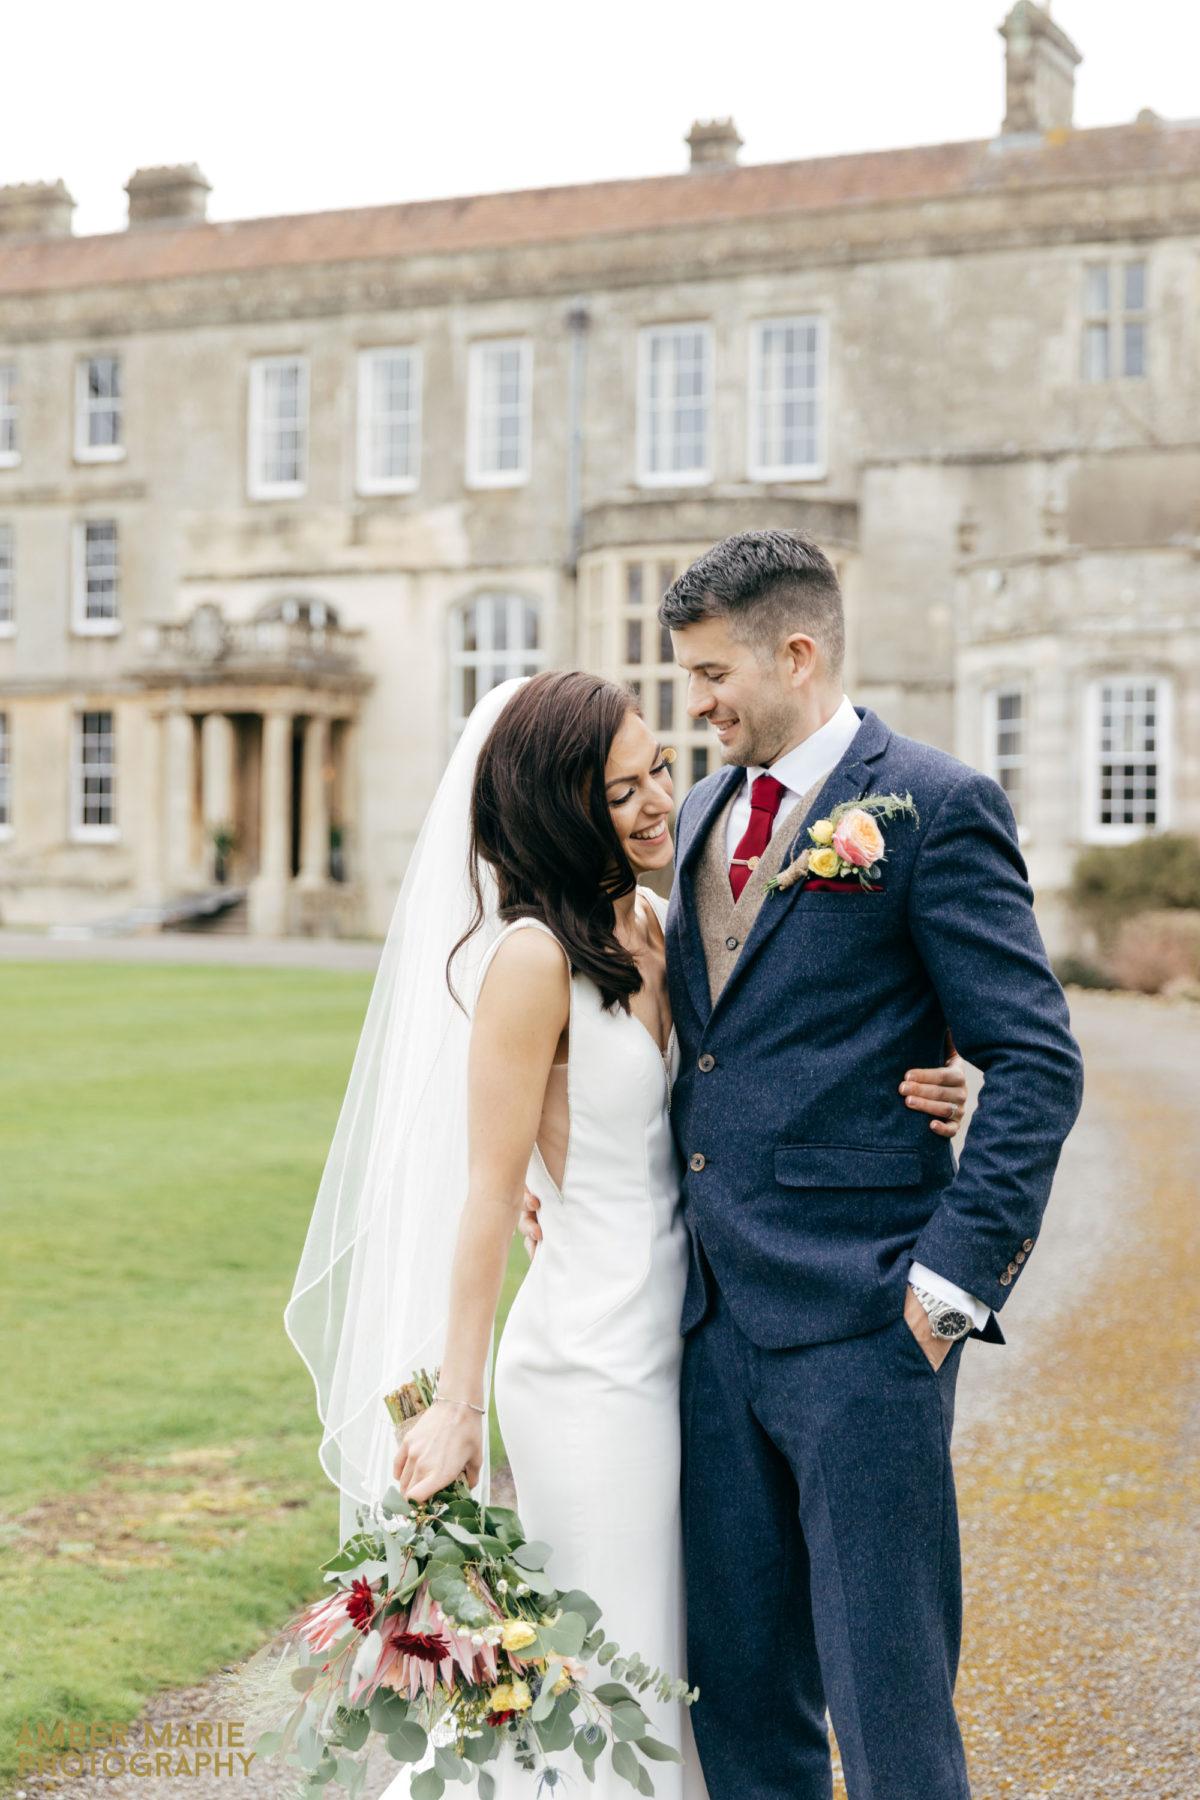 Elmore Court Wedding – Rebecca & Matt